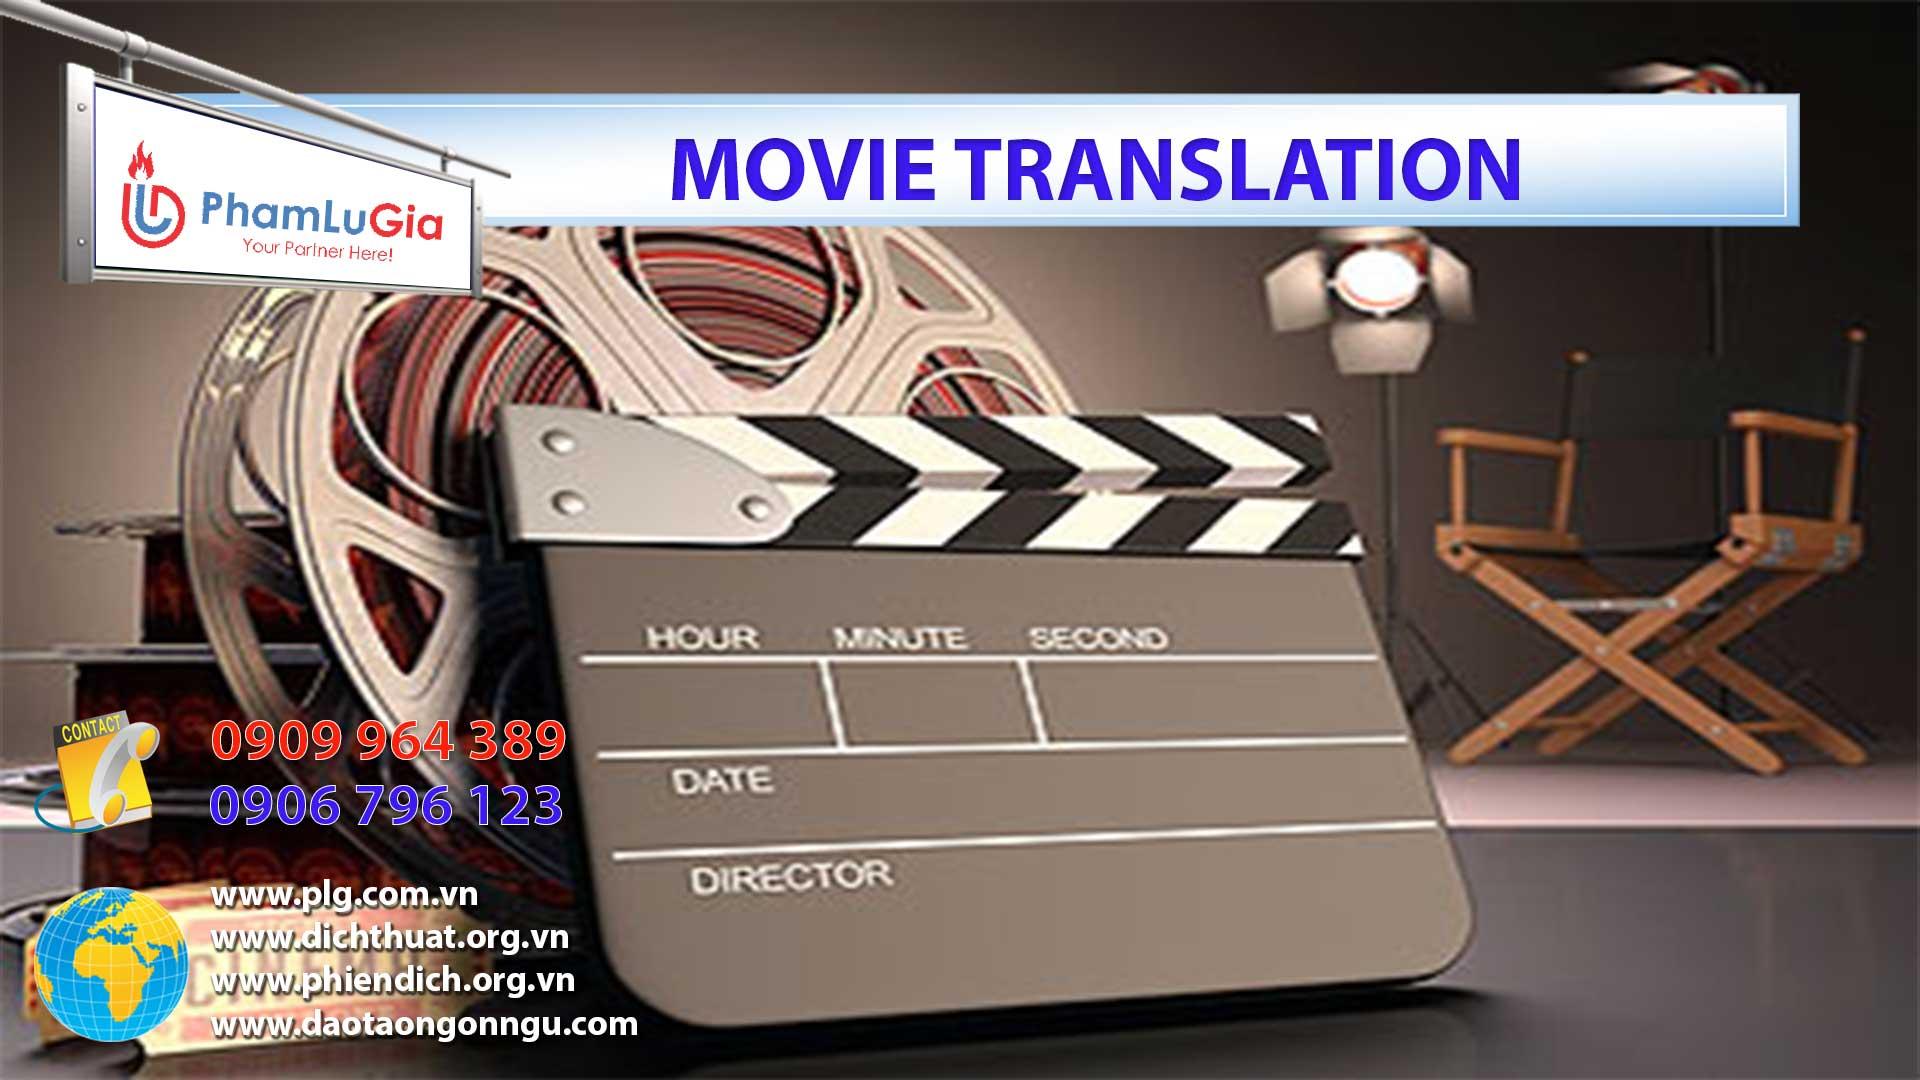 Movie Translation